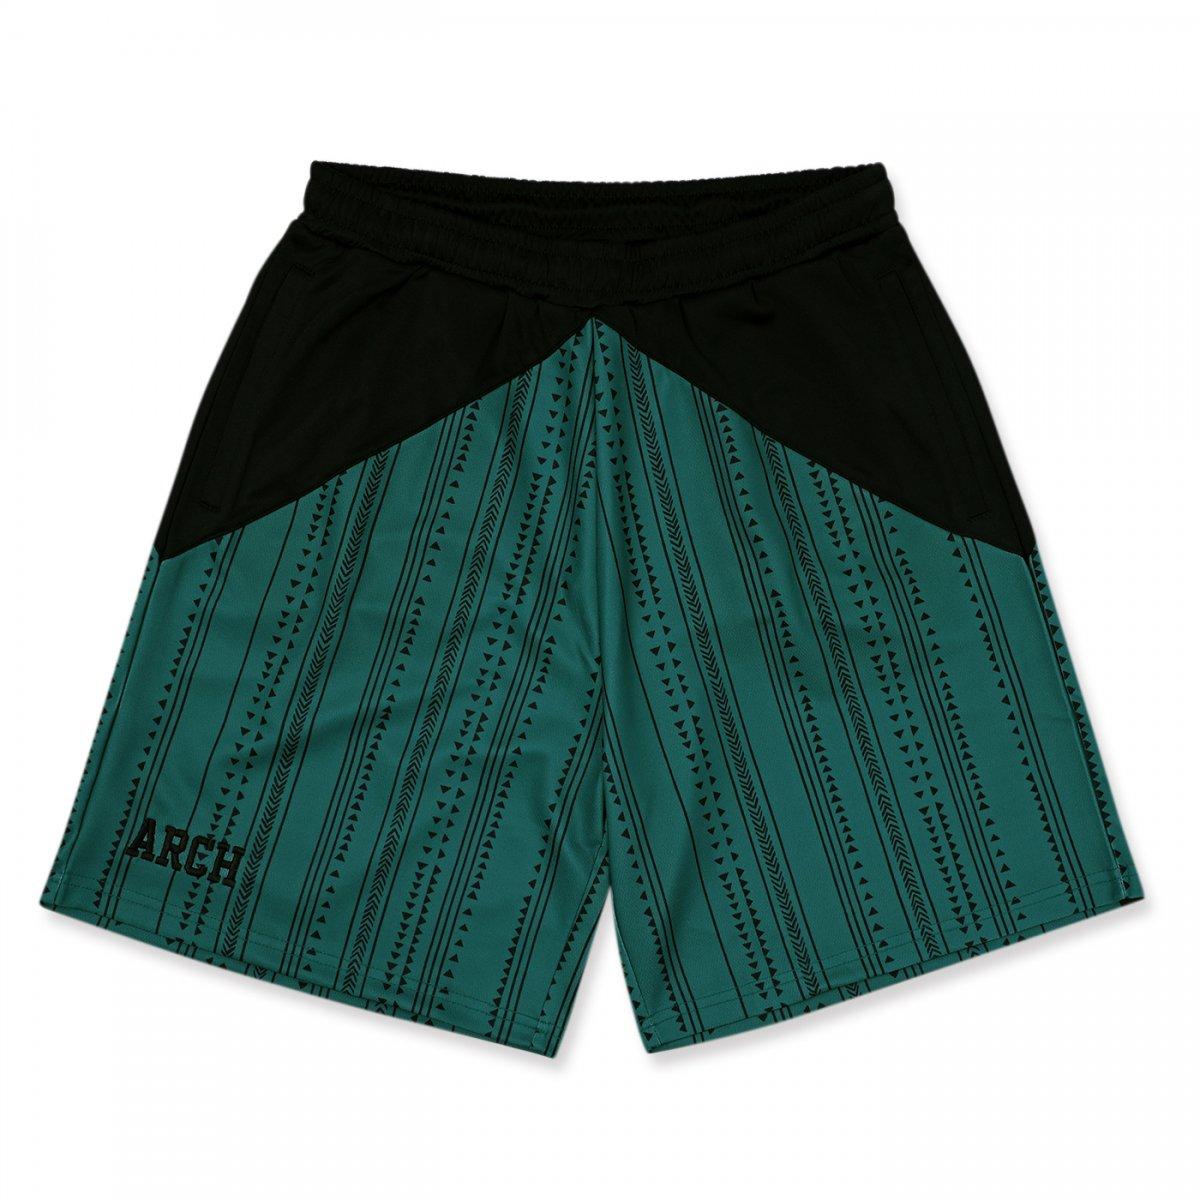 rough stripe shorts 【teal】